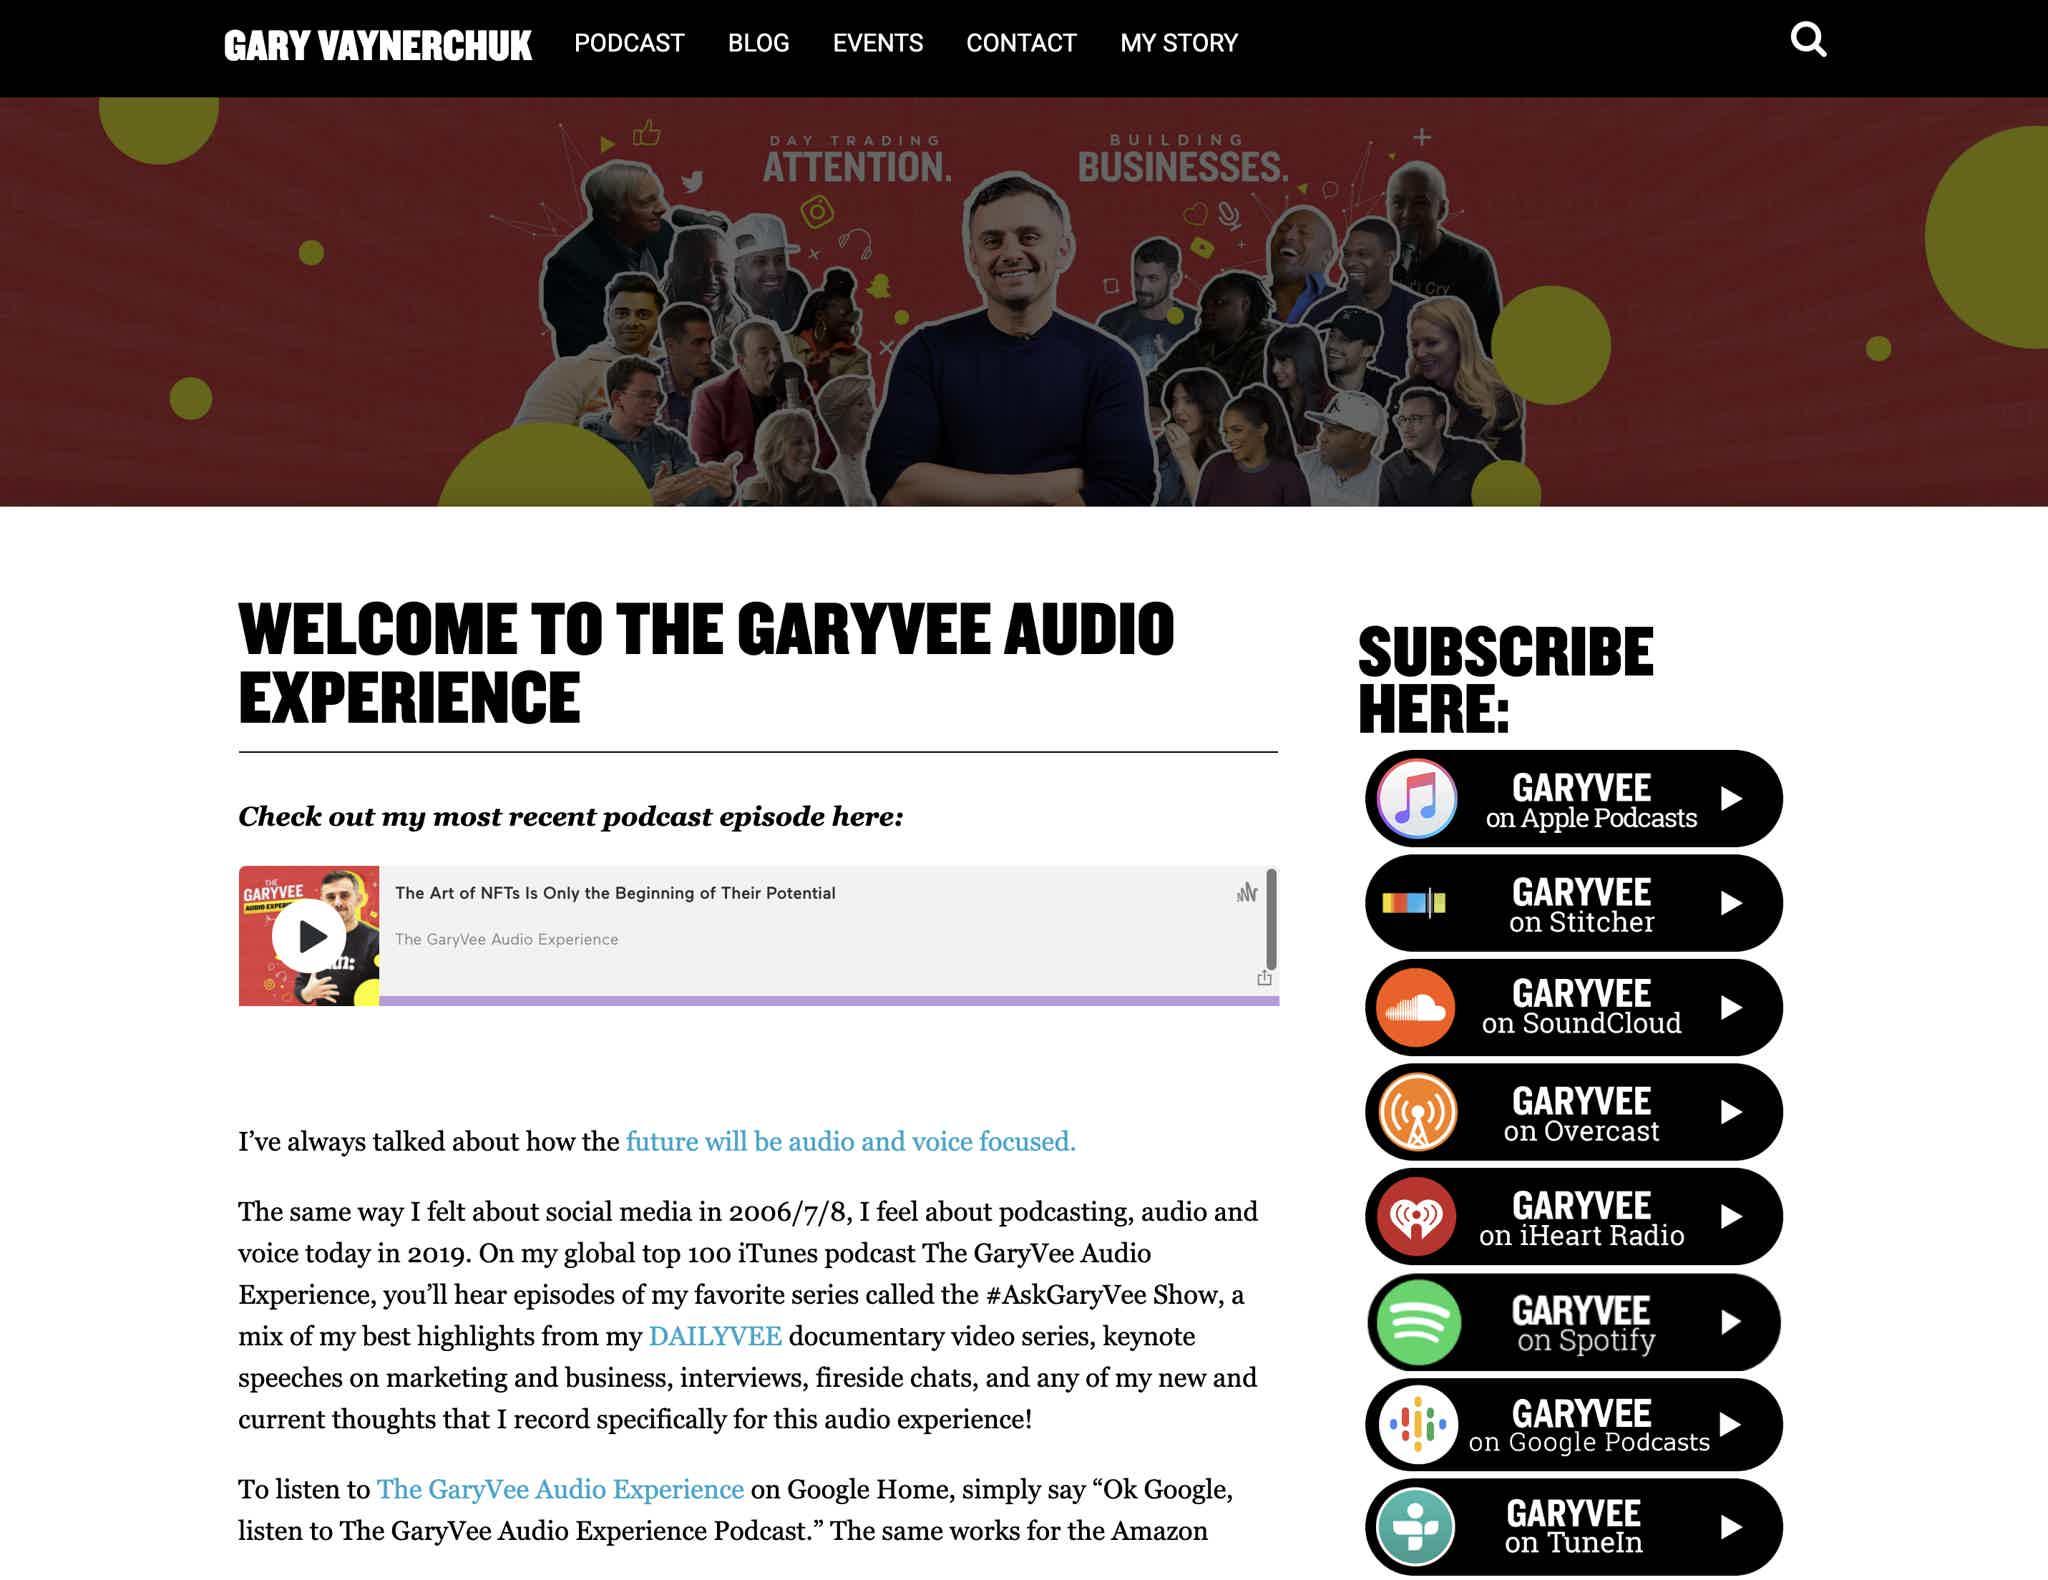 The Gary Vee Audio Experience